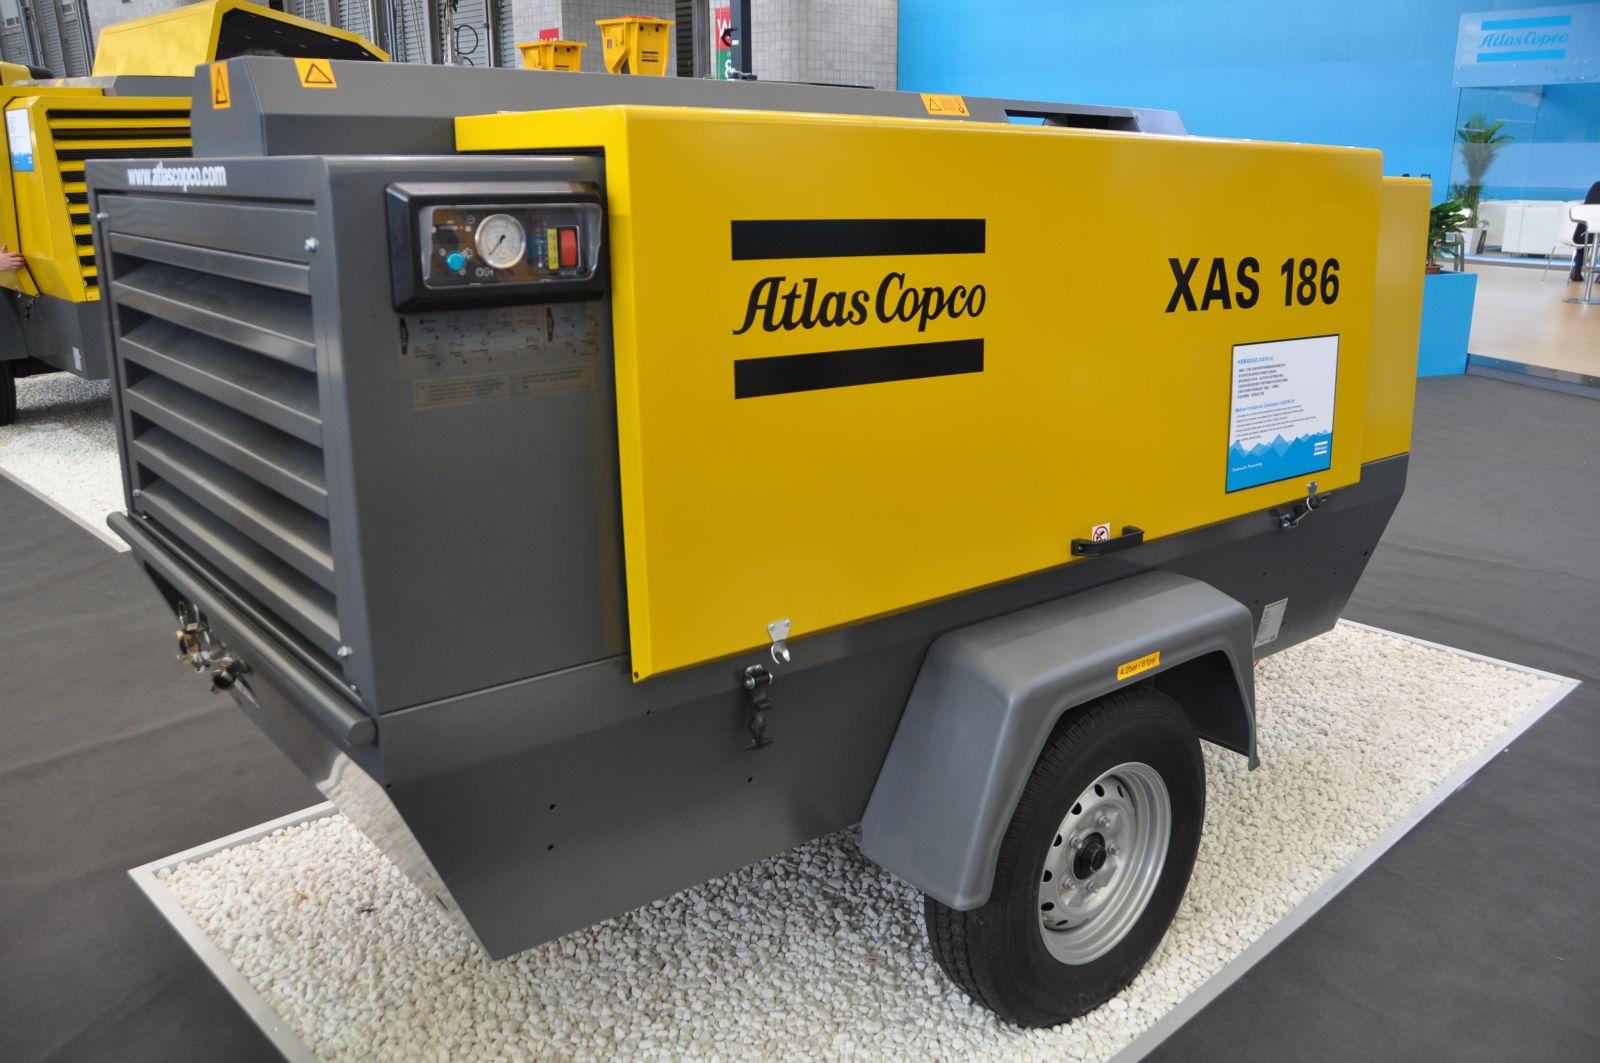 atlas copco xas 186 kompressor. Black Bedroom Furniture Sets. Home Design Ideas